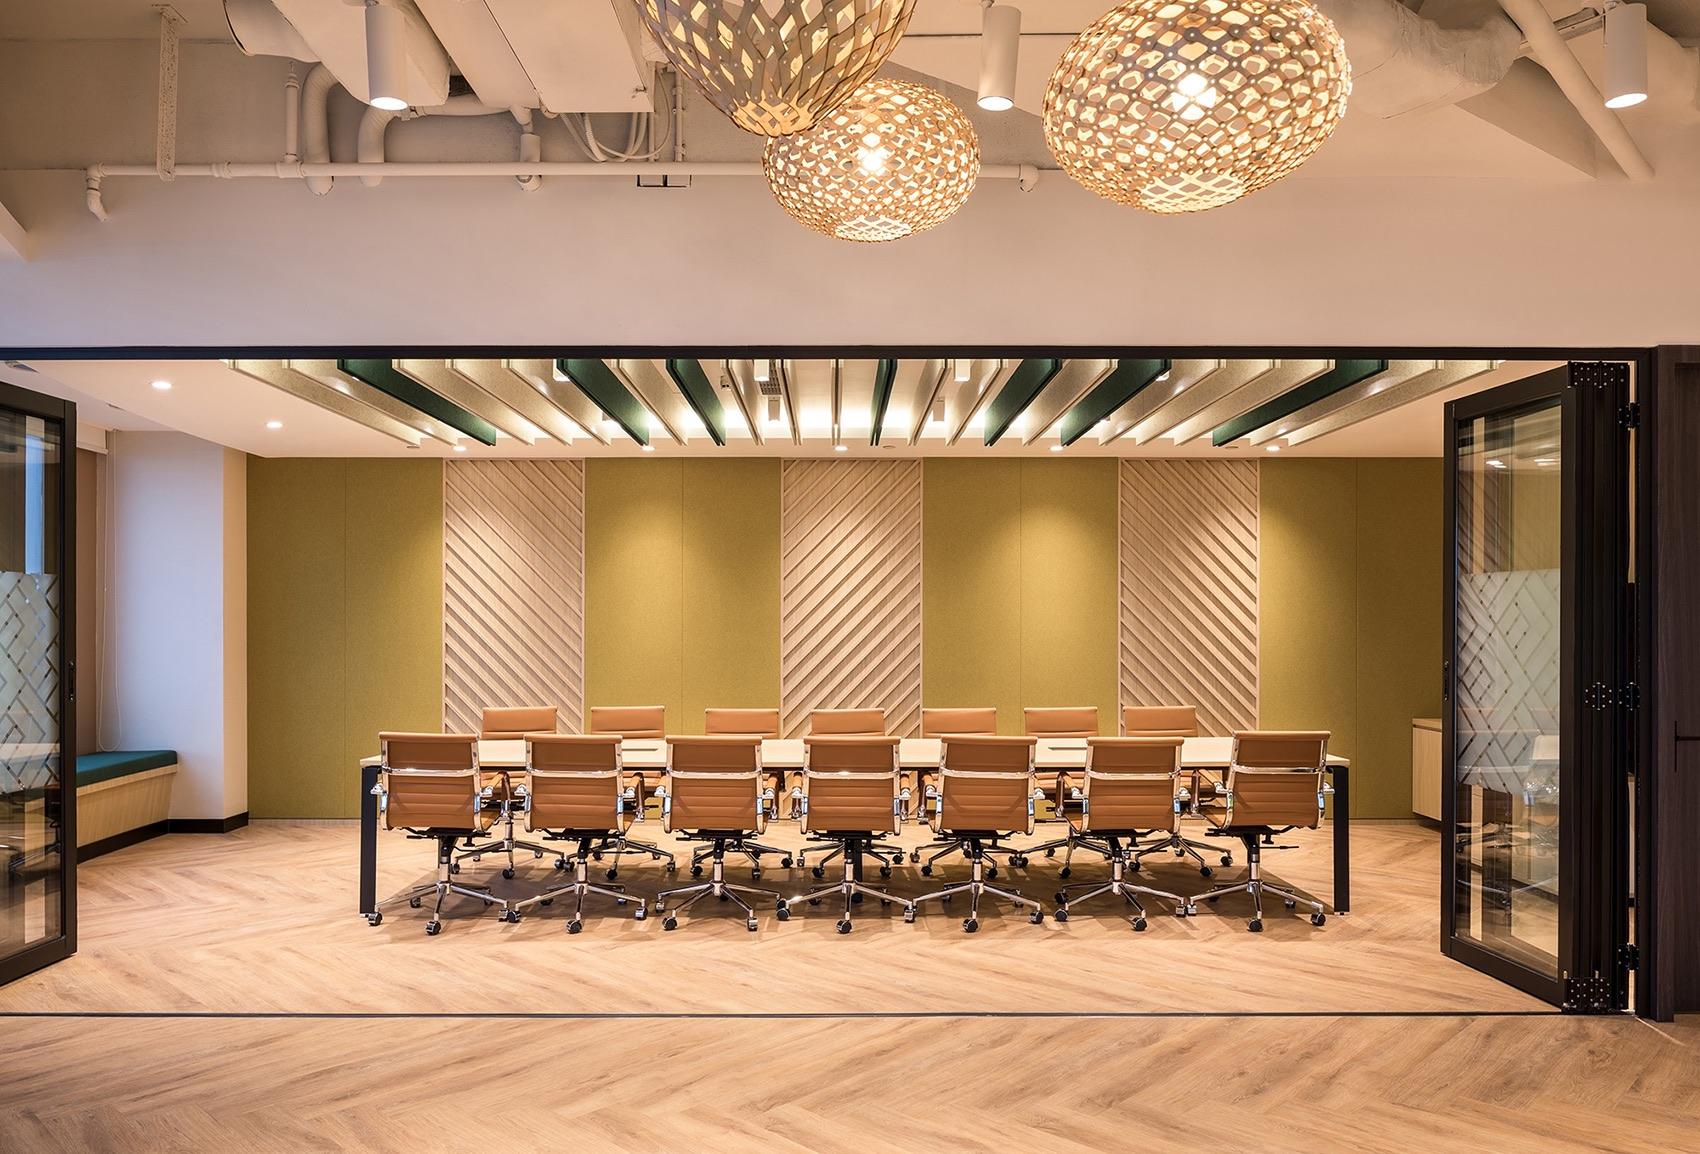 zespri-image-shanghai-office-12